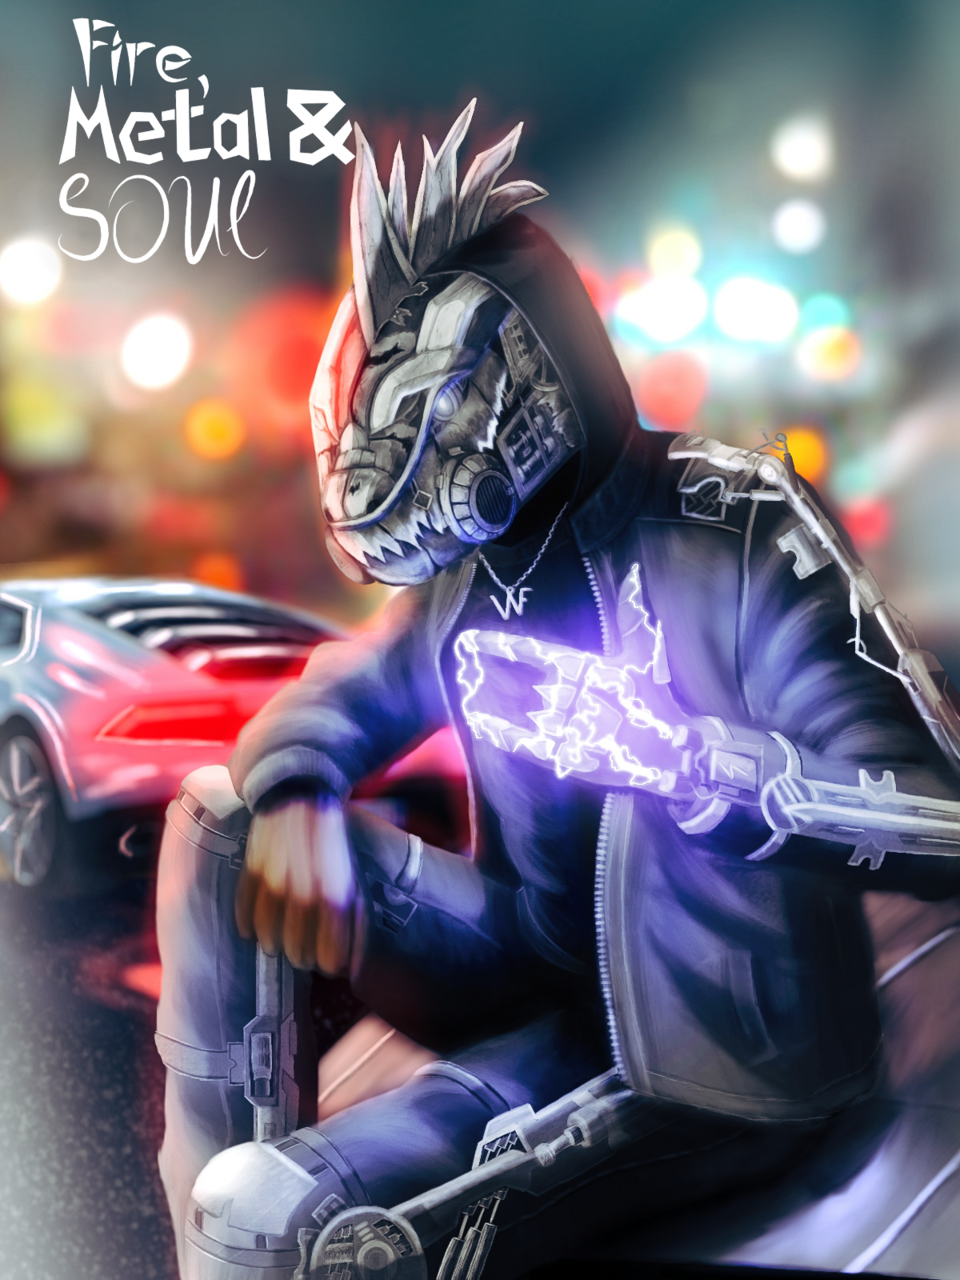 Fire, Metal & SOUL (oc) Illust of ℤ𝕖𝕟𝕜𝕒𝕥𝕒𝕣 medibangpaint Whitefire illustration electric realistic night dragon supercar cyberpunk oc